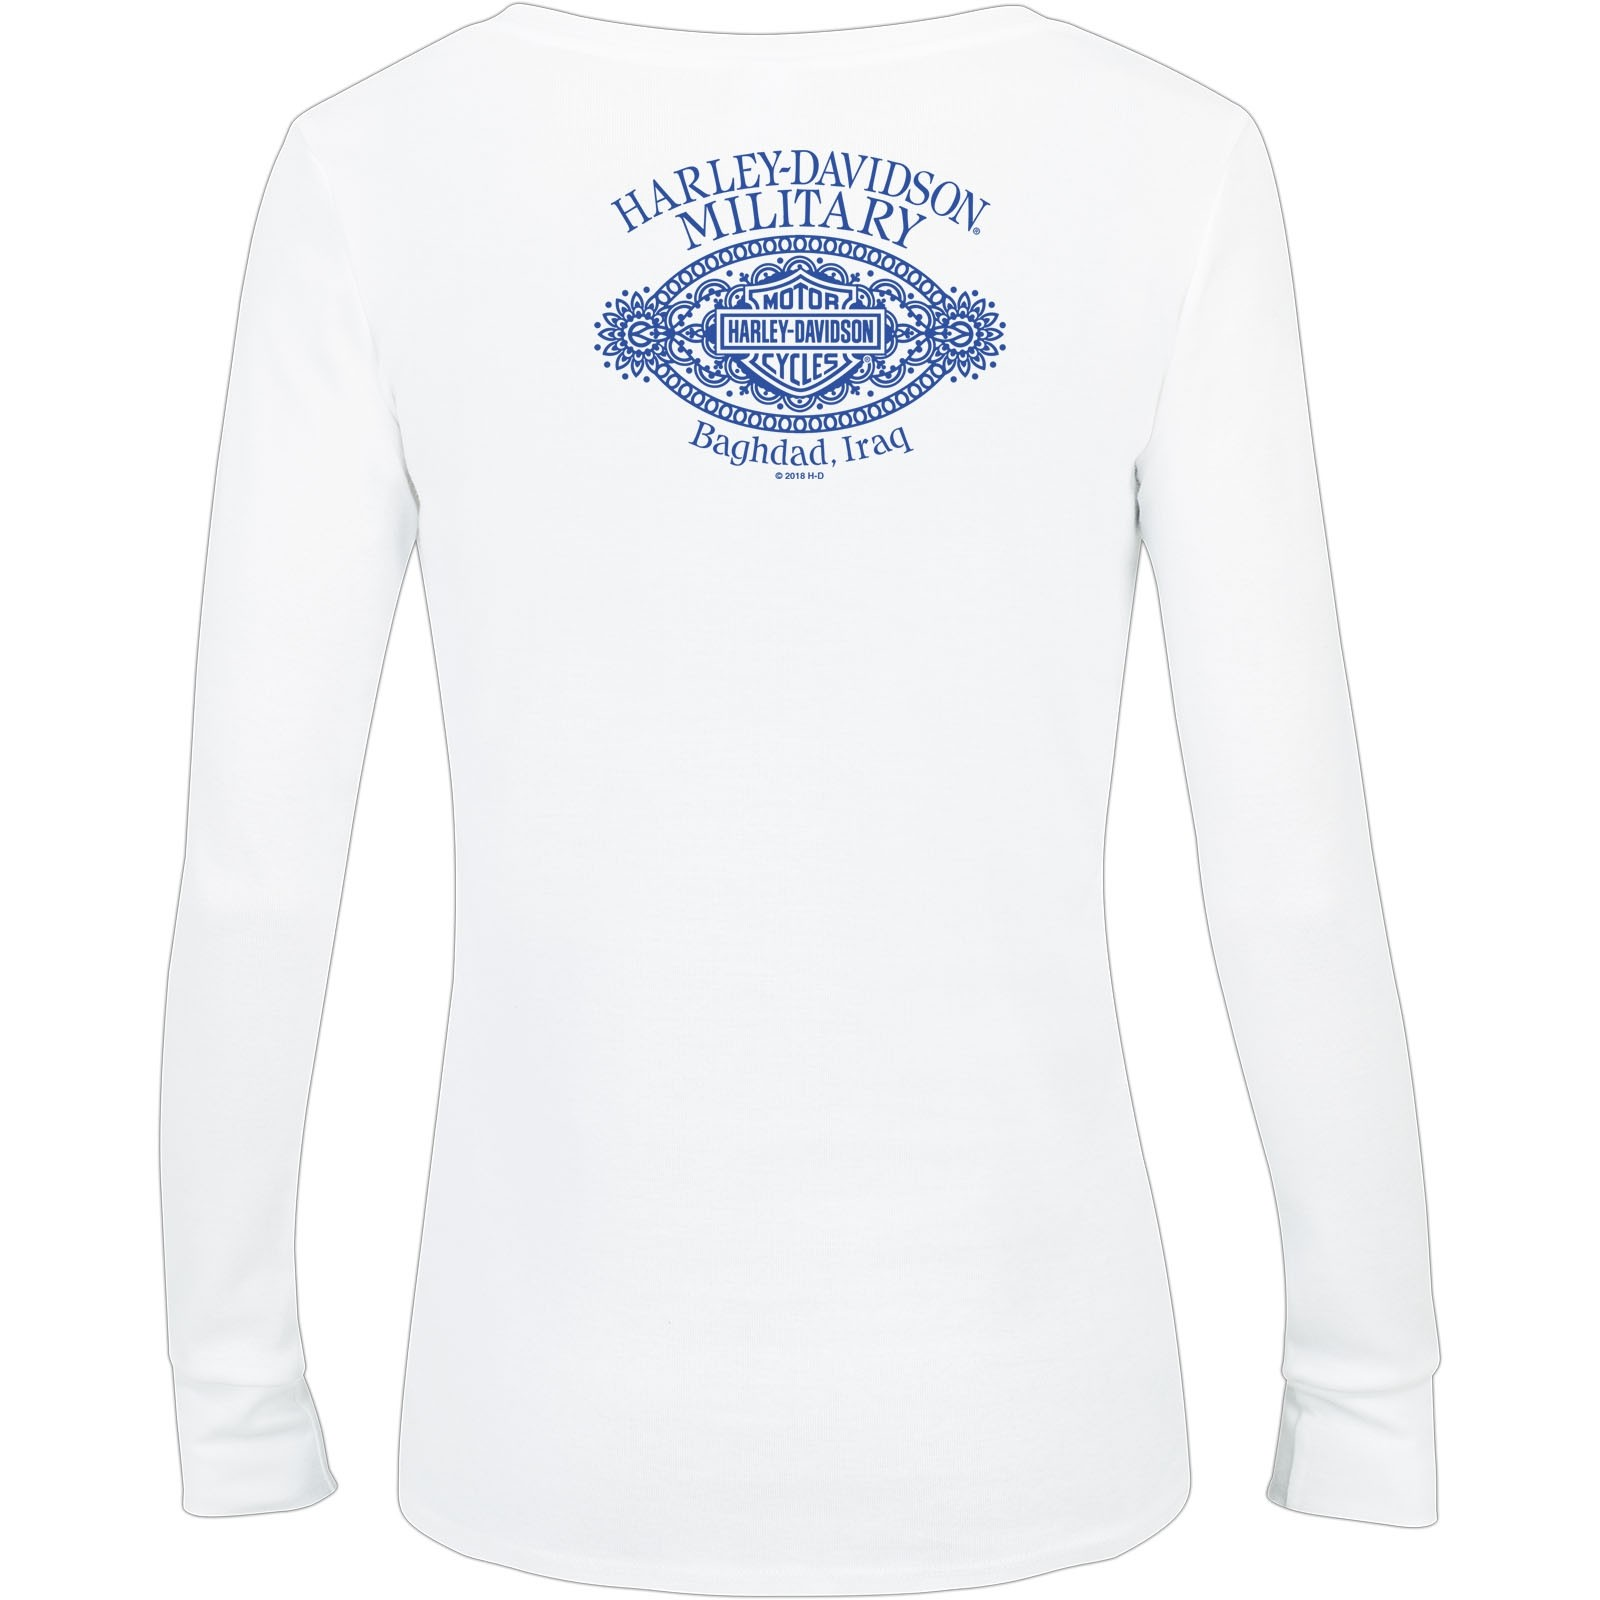 2b2394eea652 Harley-Davidson Women's Long-Sleeve V-Neck Tee - Baghdad   Polished